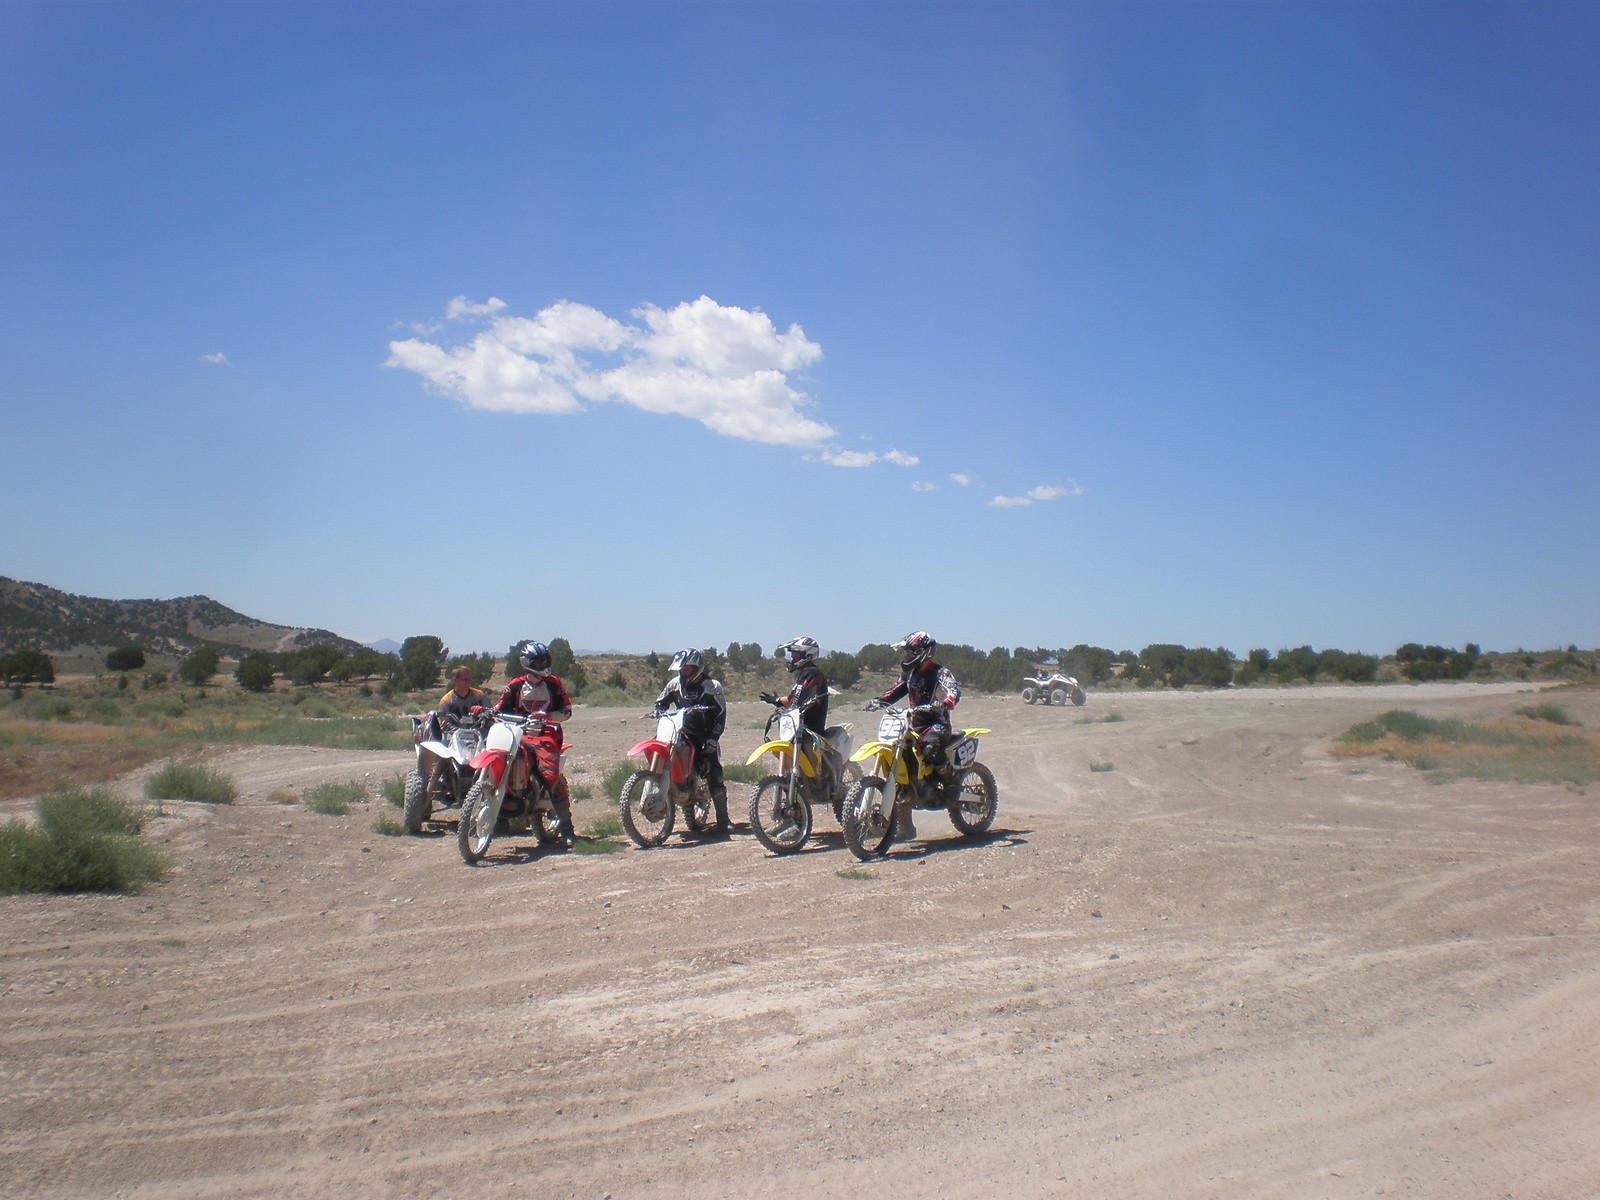 5 mile pass utah - CR92 - Motocross Pictures - Vital MX